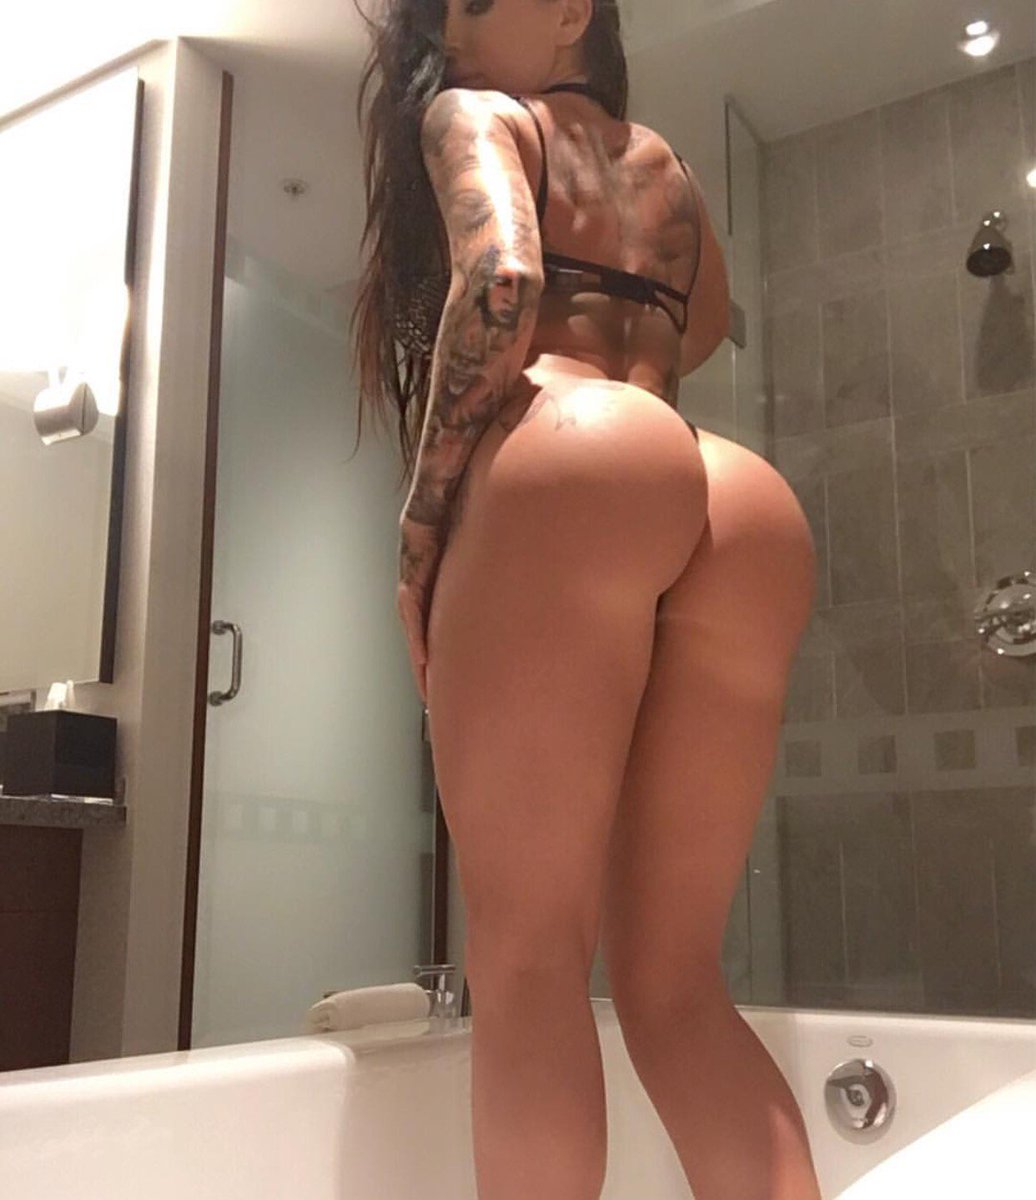 nake girls big buts in tub